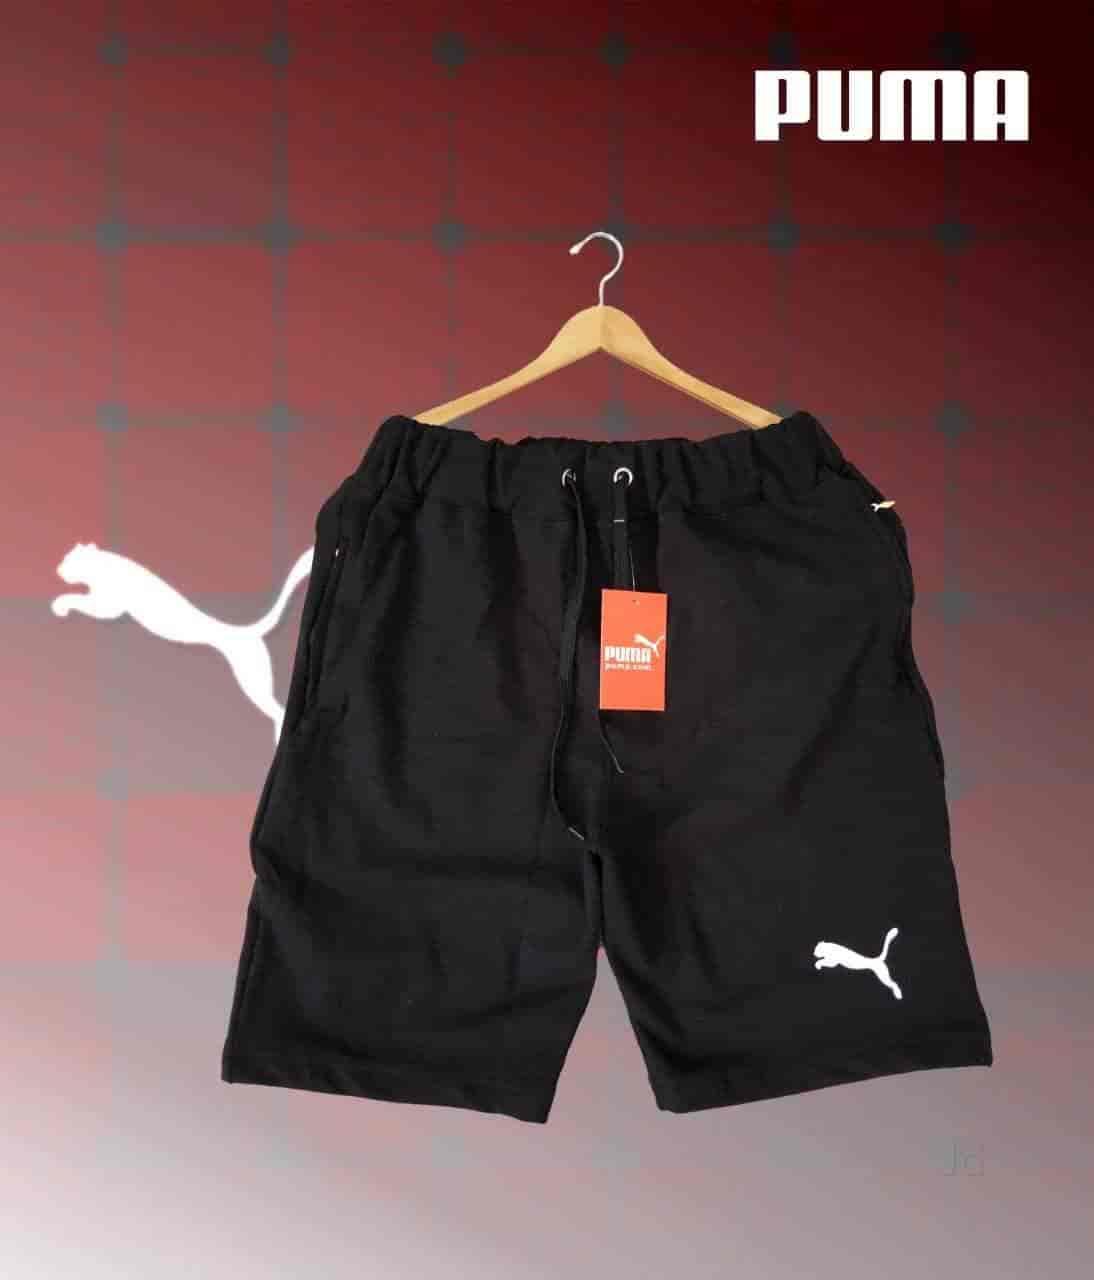 5921d4ec30e Bermuda Shorts Dress Code